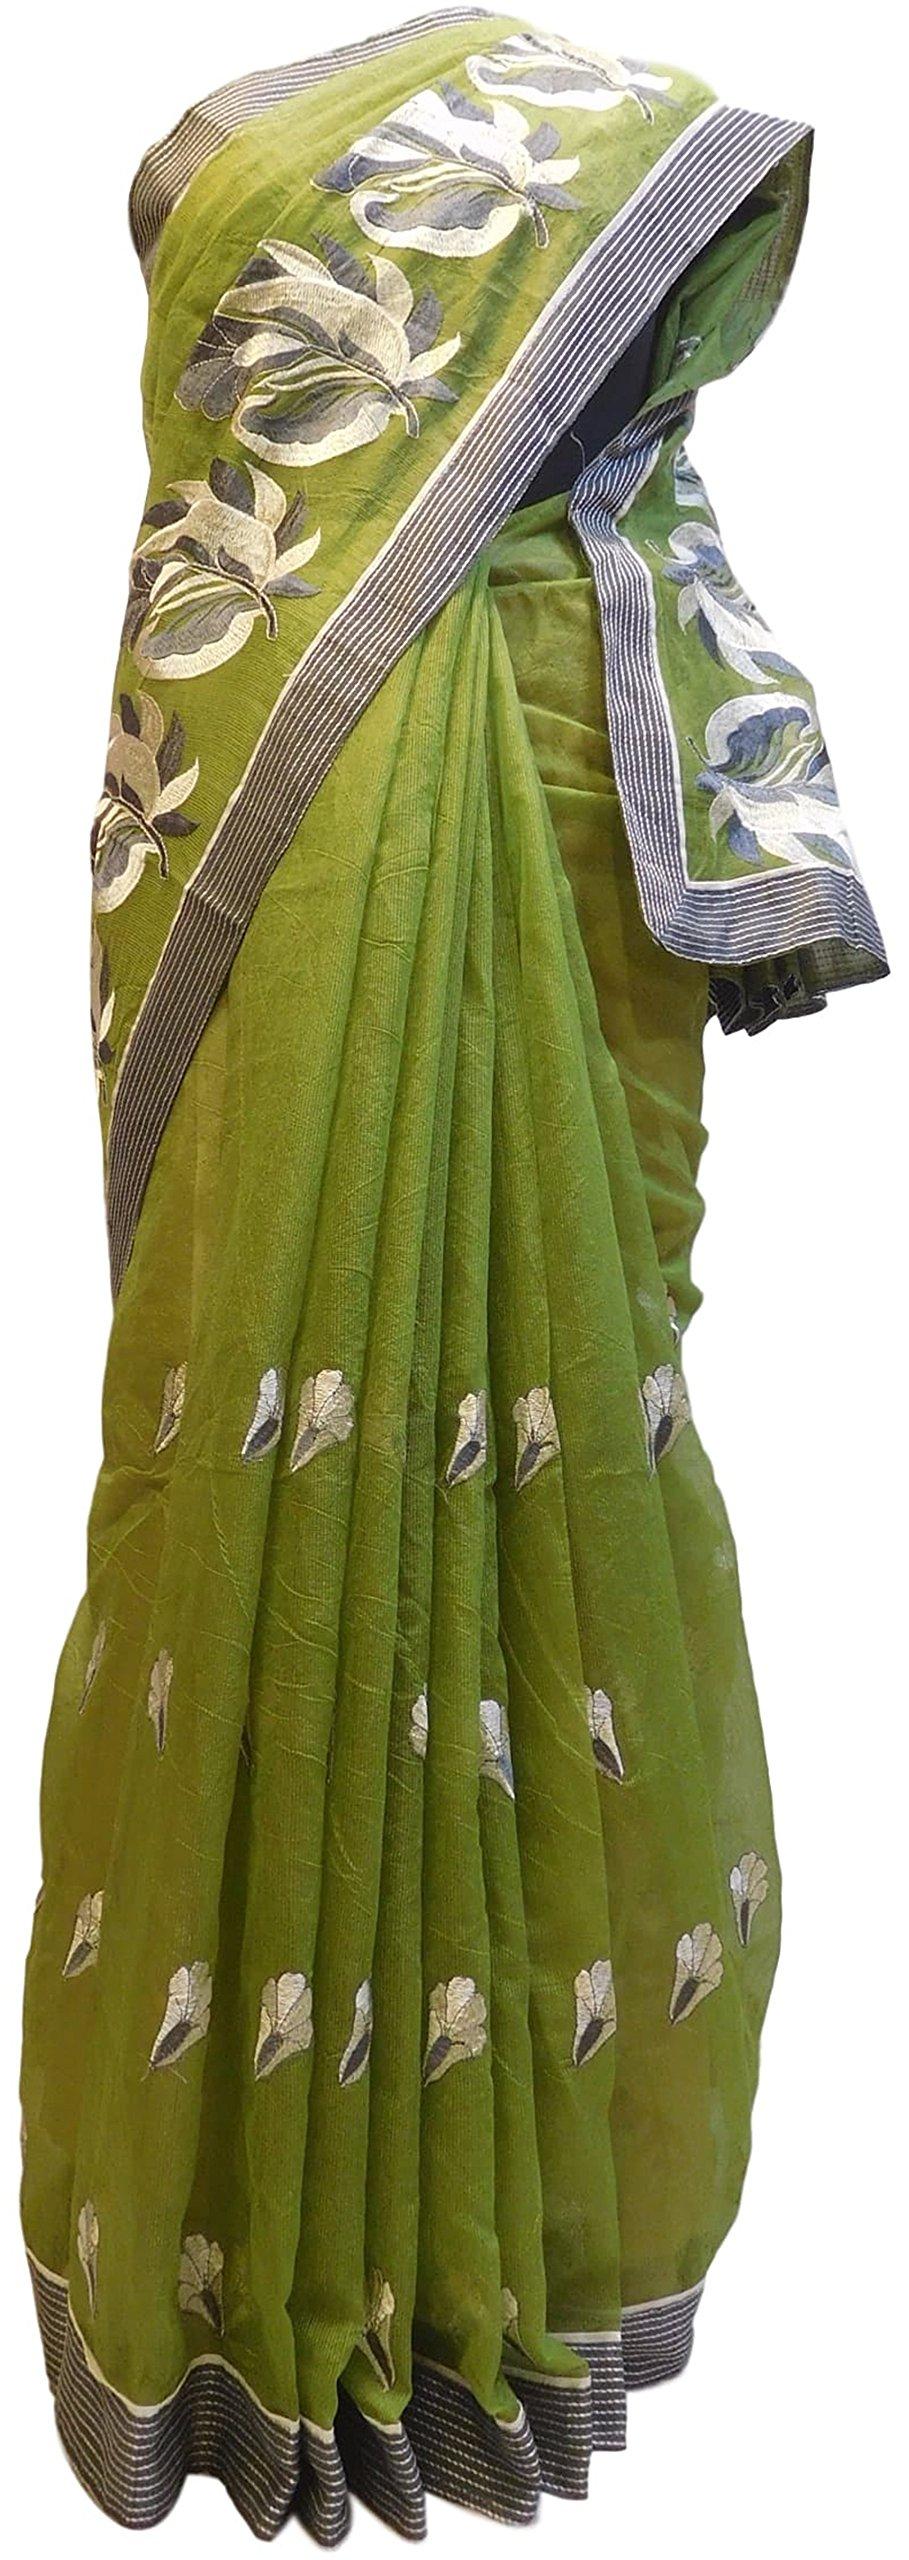 SMSAREE Women's Designer Supernet (Cotton) Hand Embroidery Saree Sari Free Size Mehendi Green